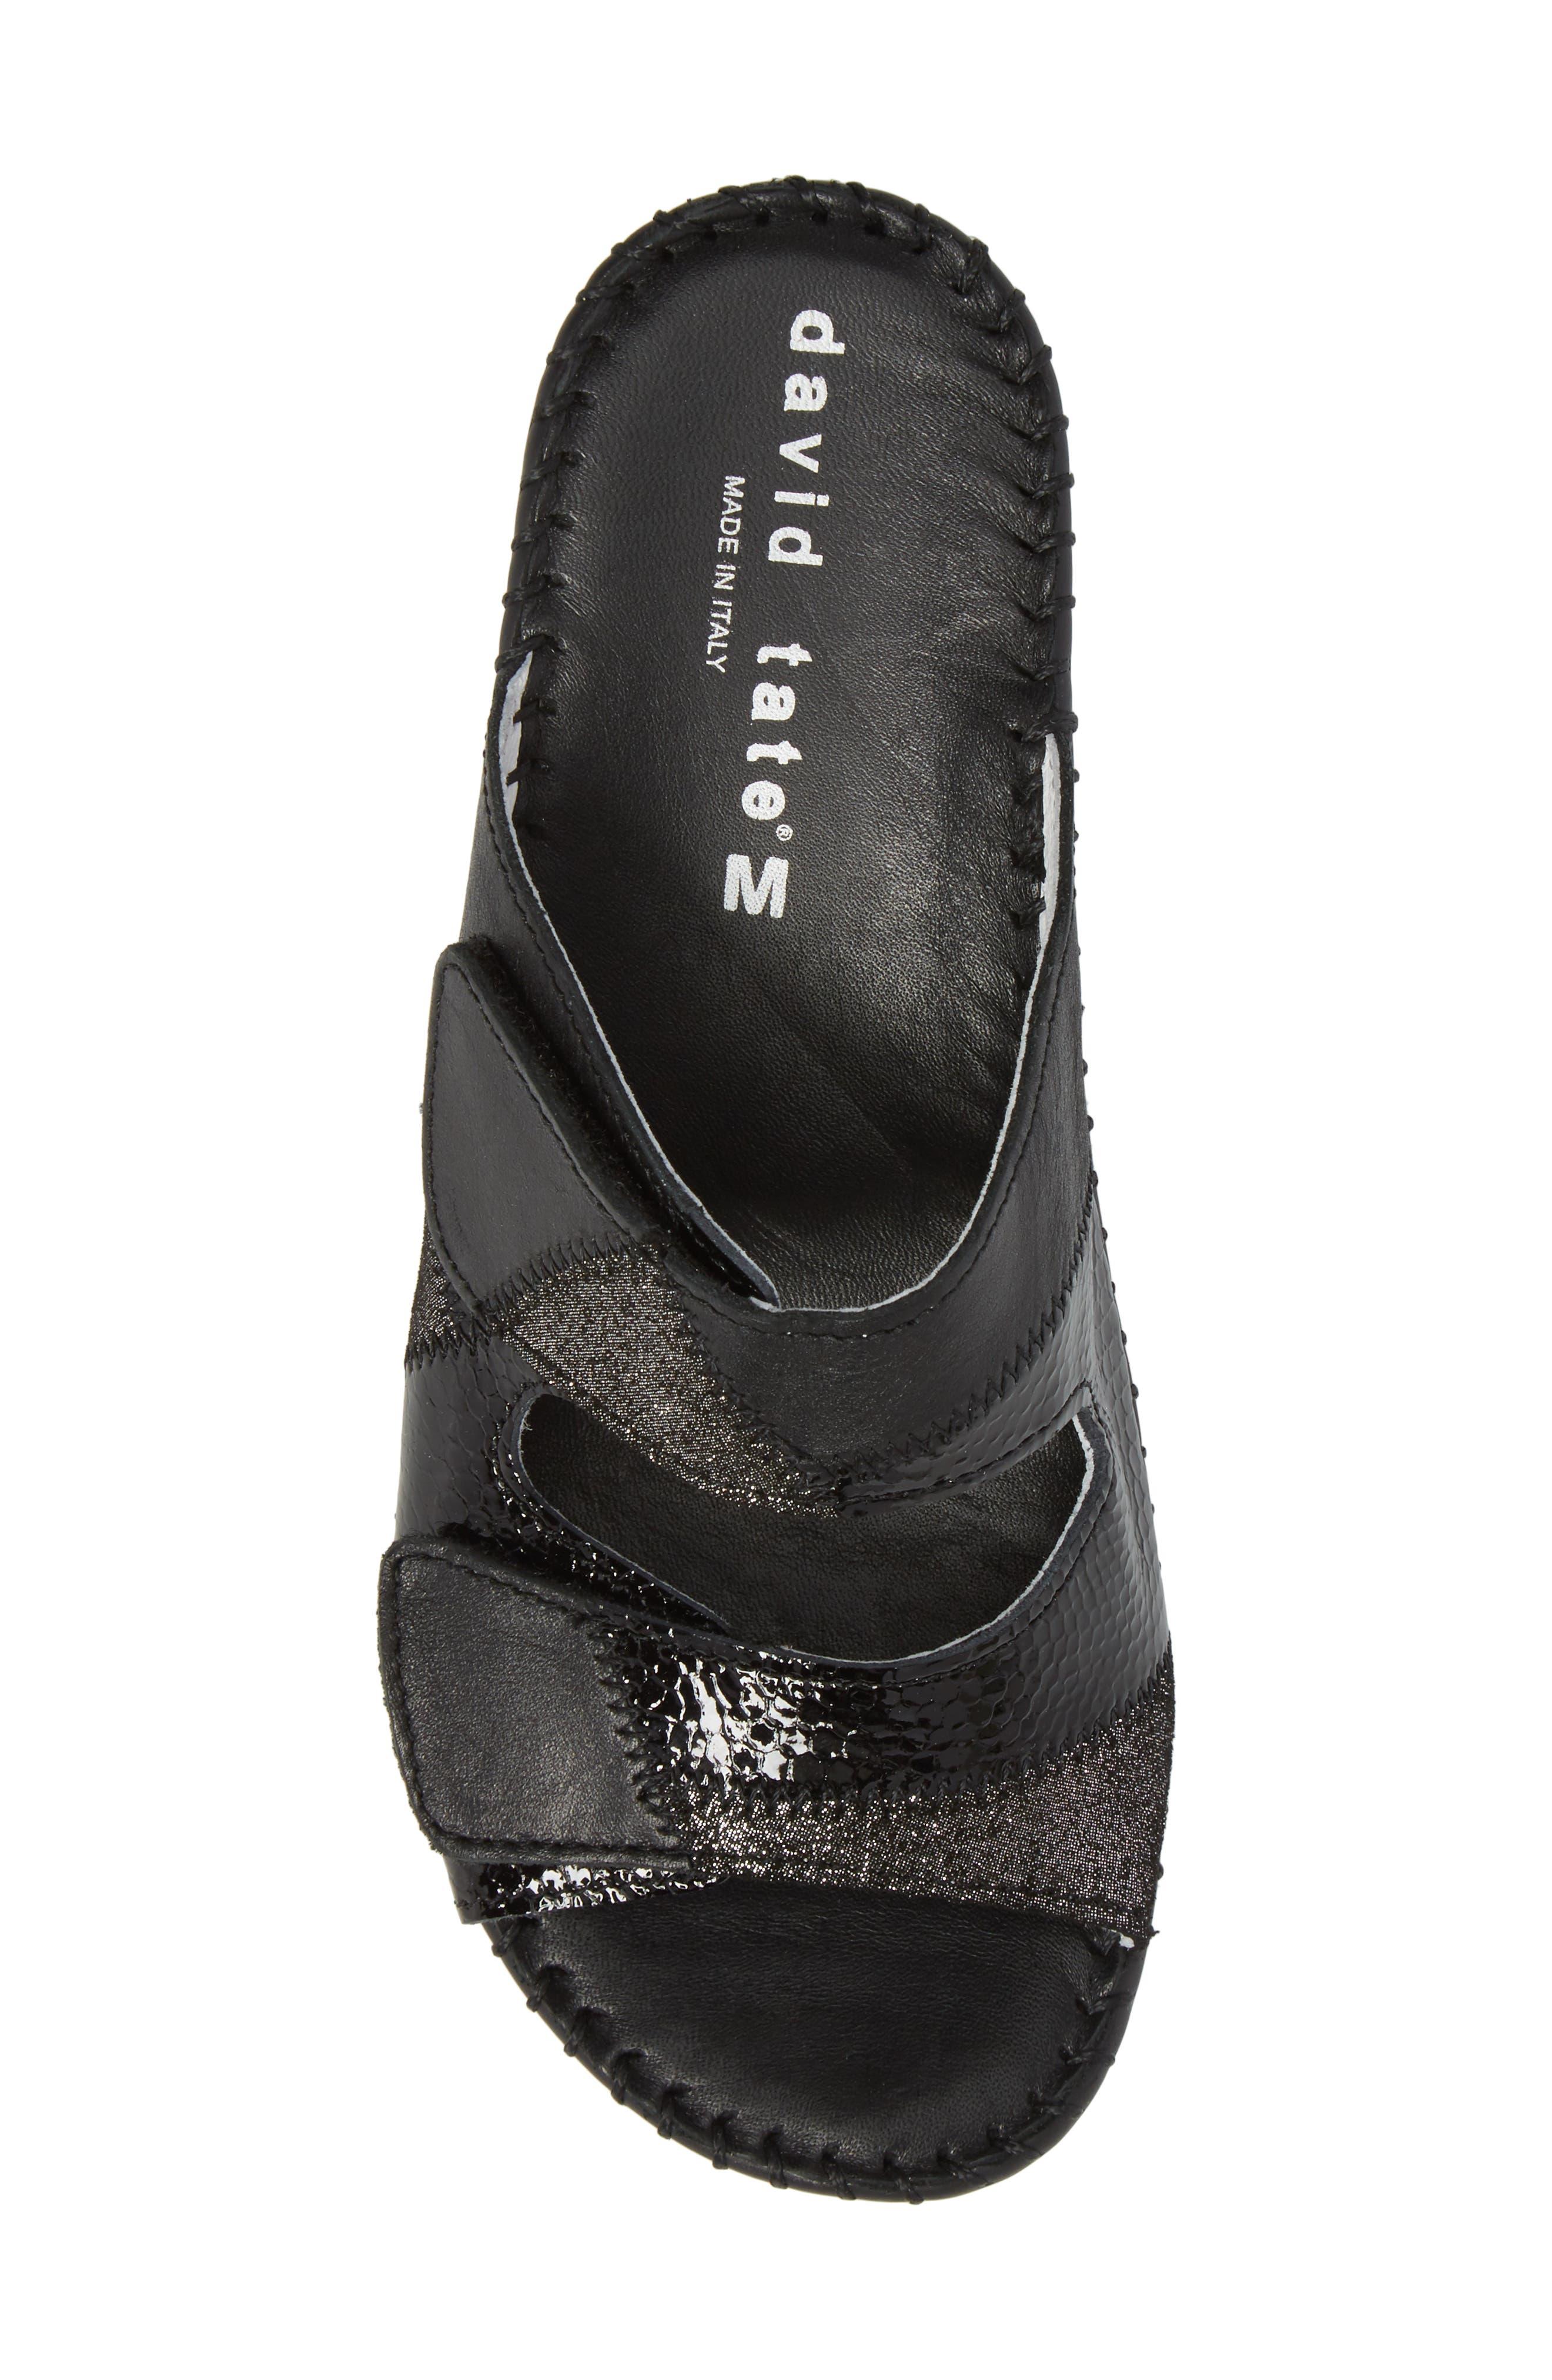 Flex Slide Sandal,                             Alternate thumbnail 5, color,                             Black Leather